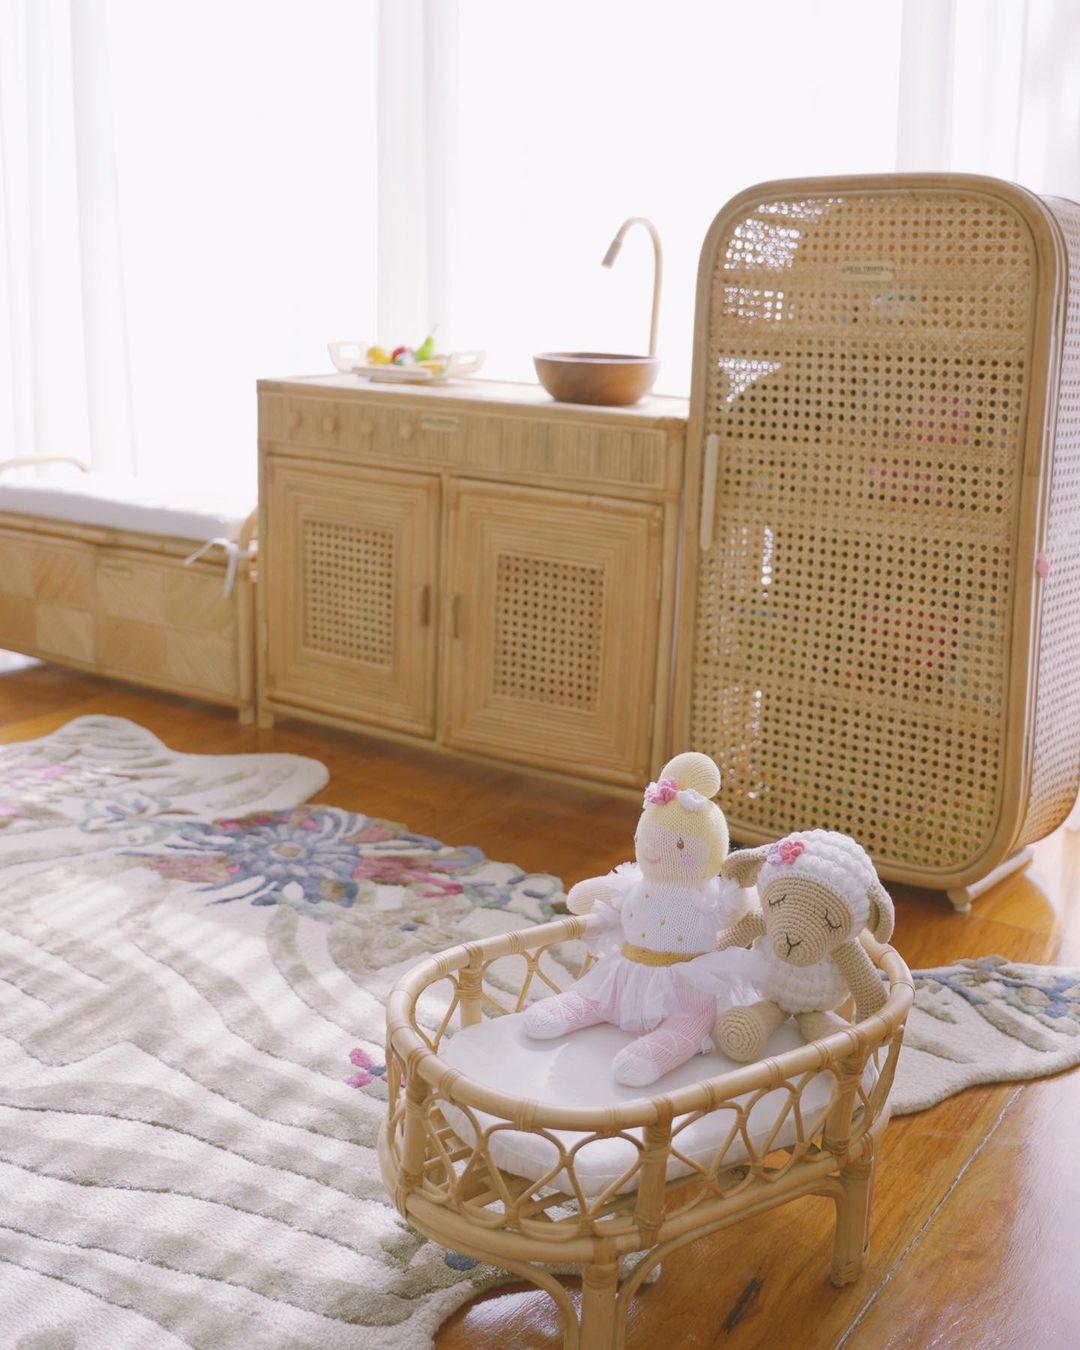 anne curtis' rattan furniture silya tropika